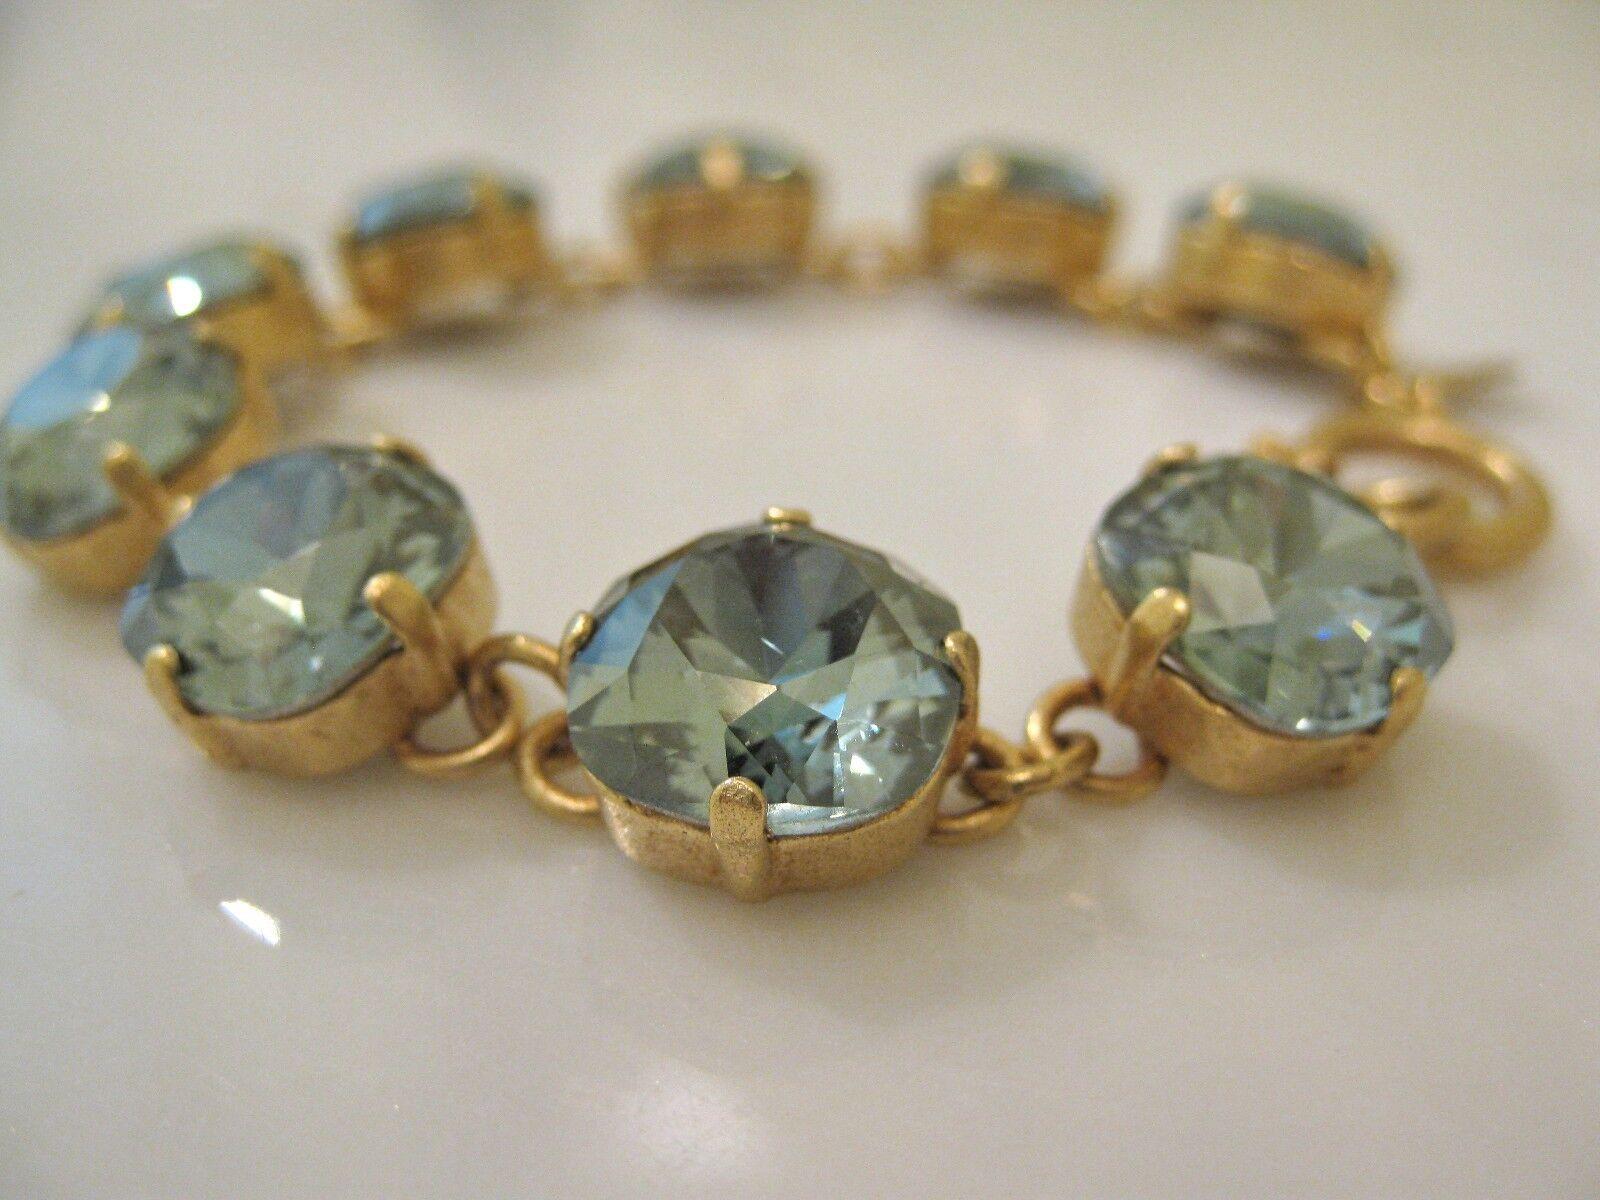 NWT La Vie Parisienne C. Popesco gold Marine Green Crystal Bracelet 1696G